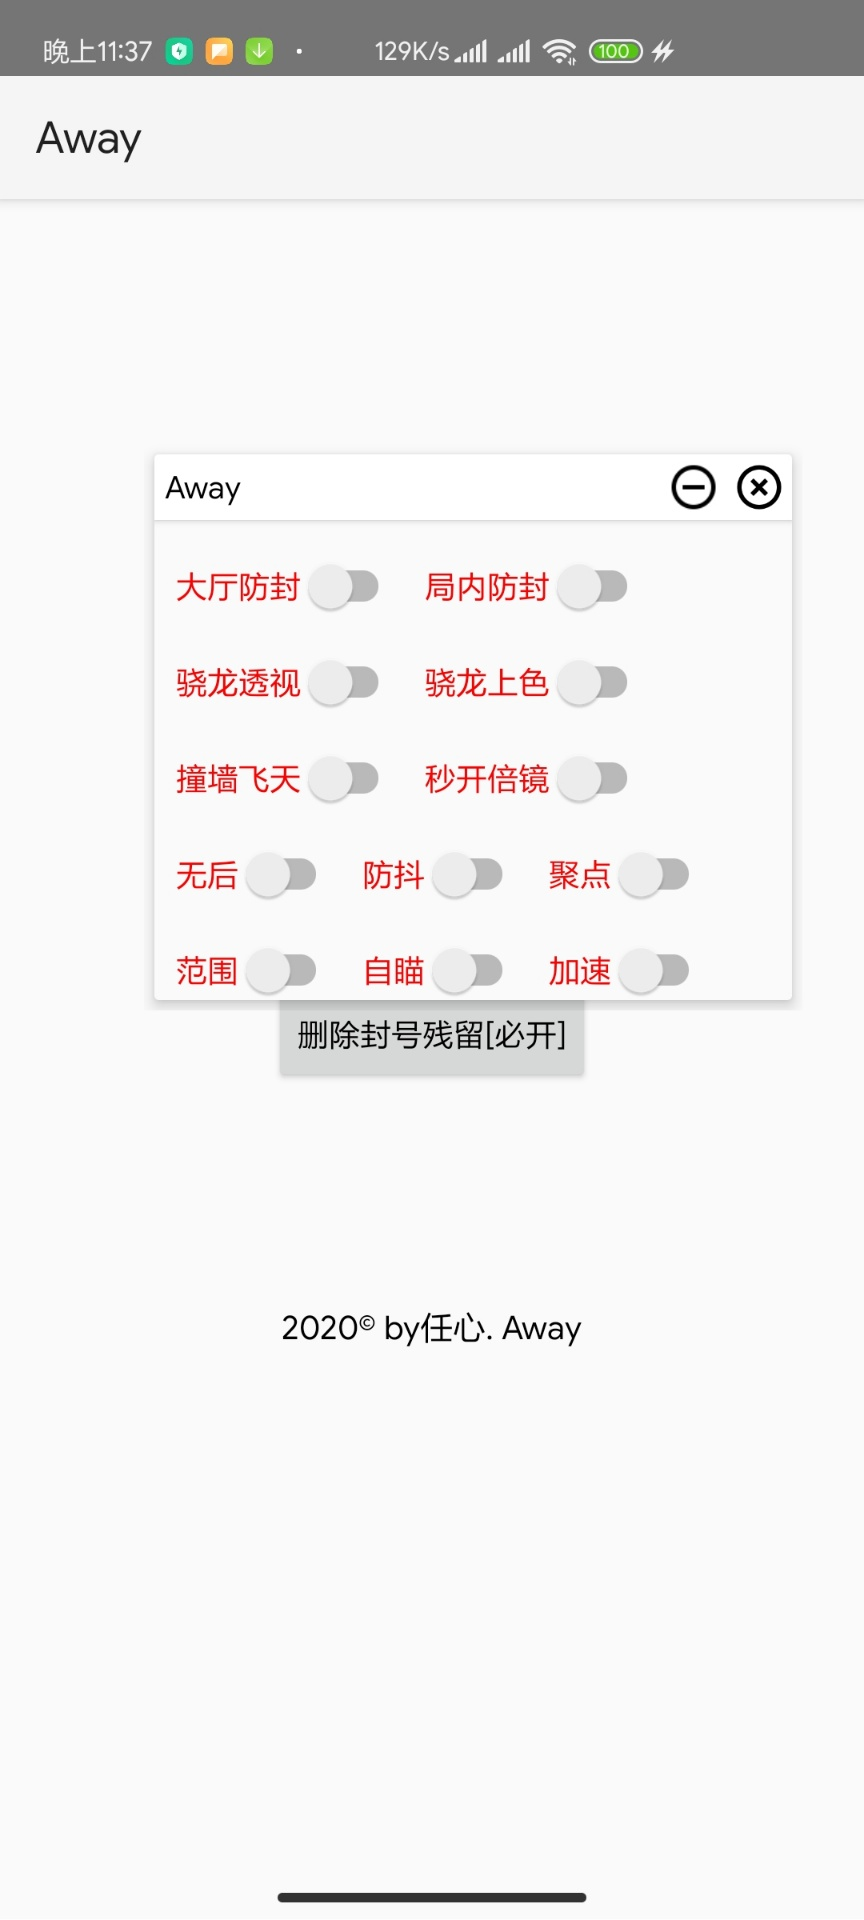 Screenshot_2020-12-29-23-37-30-133_com.tencent.zhus.jpg